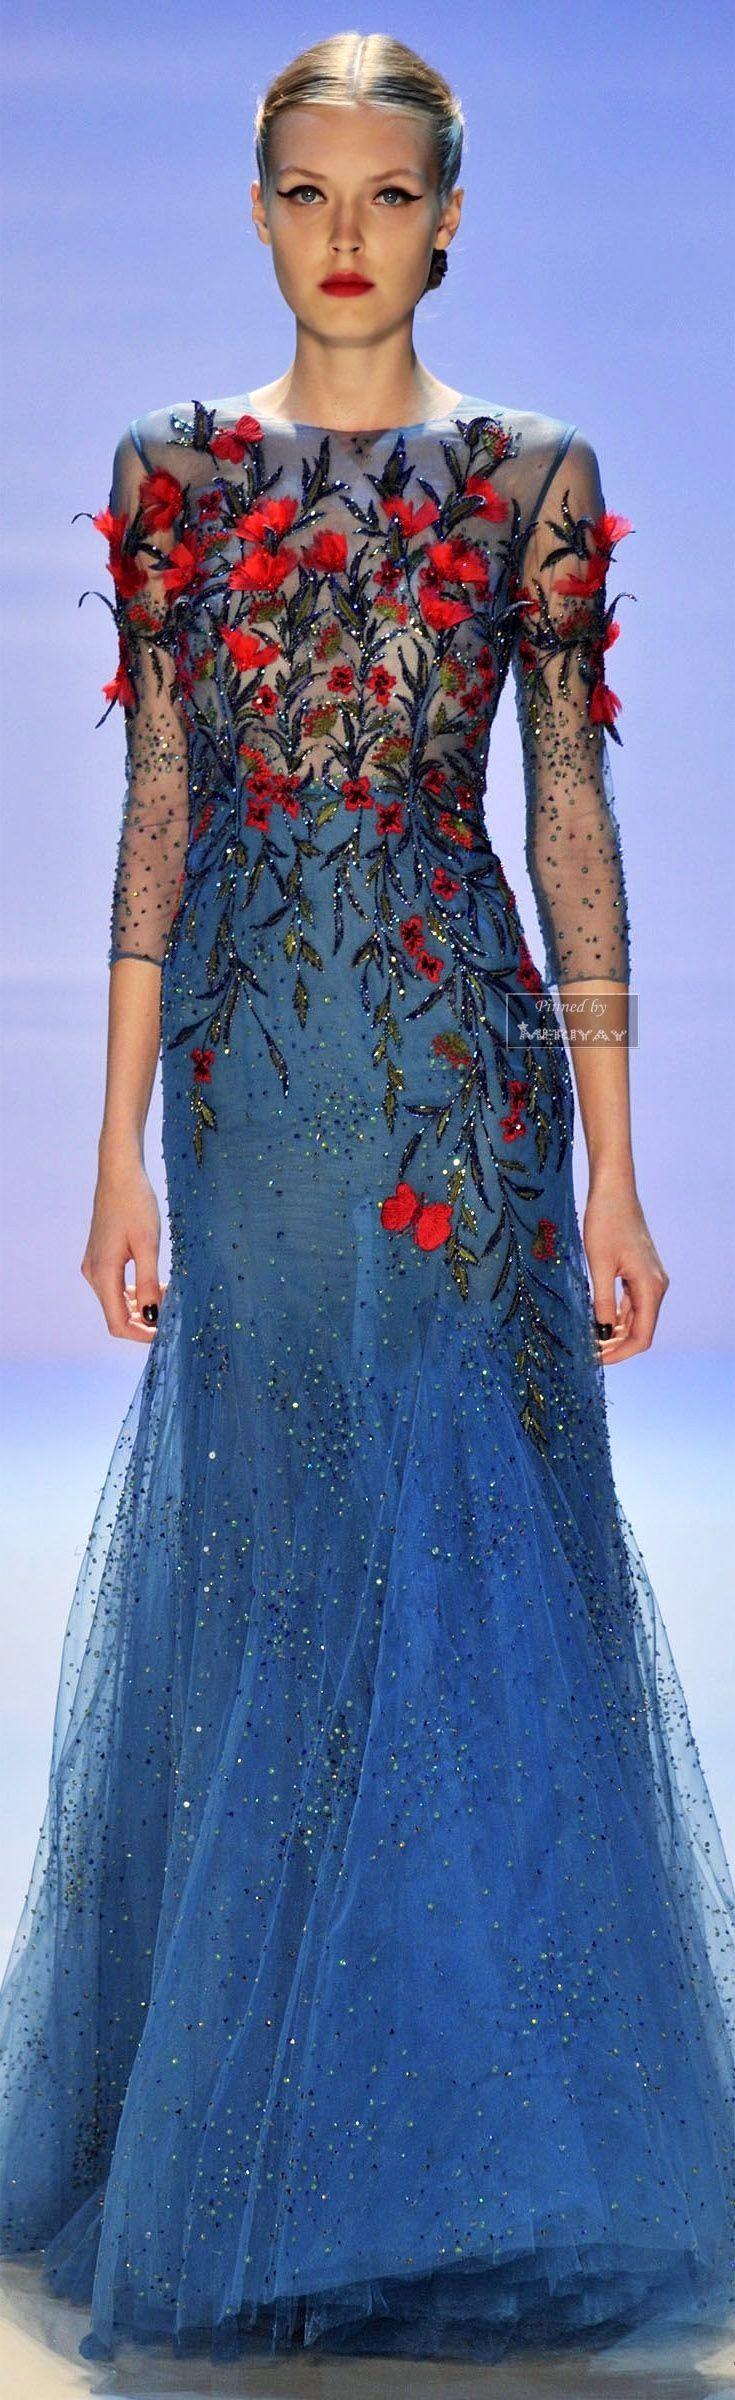 Elie Saab. Red carpet perfection.